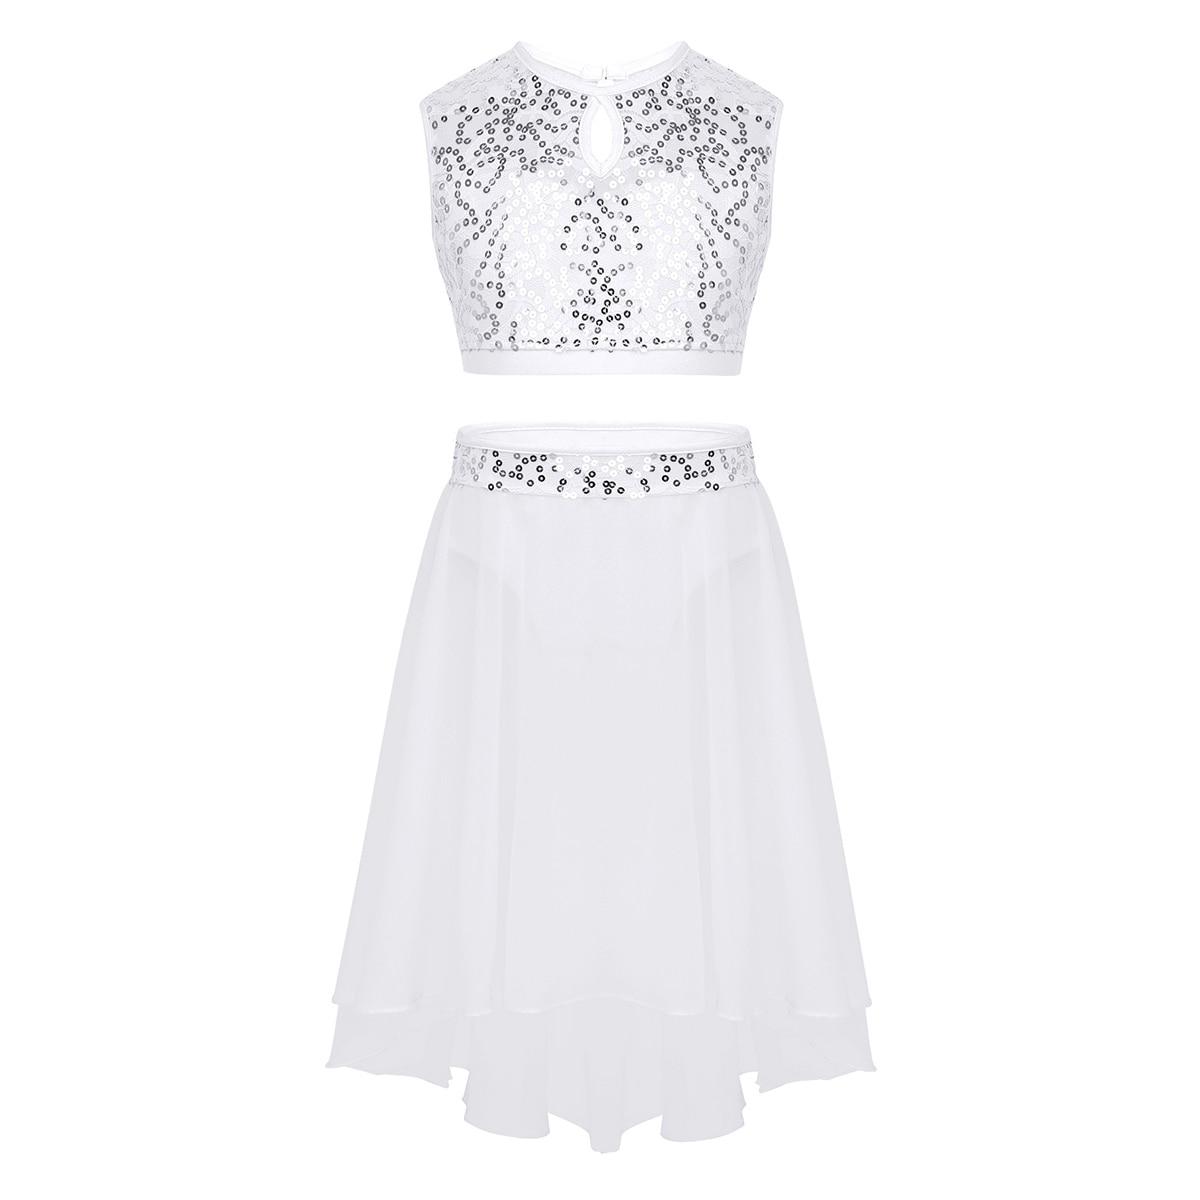 Image 4 - Girls Lyrical Dance Costumes Ballet Dress Sleeveless Sequined Crop Top with Dipped Hem Chiffon Skirt Set for Celebration DancingBallet   -